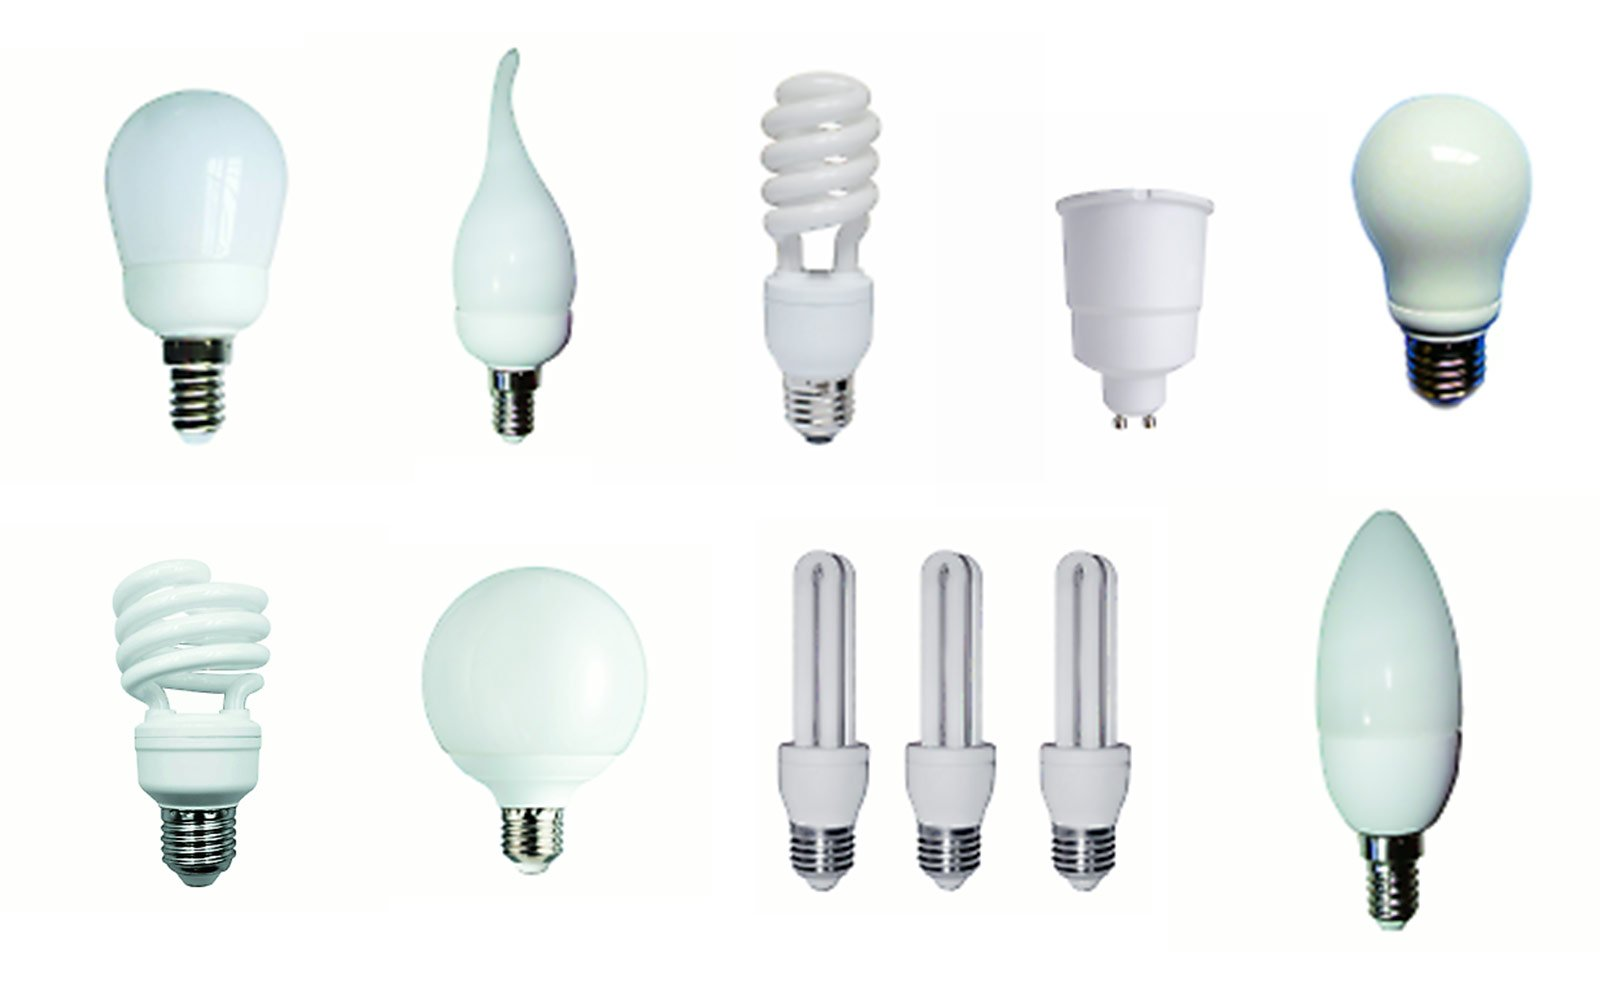 Lampade fluorescenti stop all ecocontributo raee cose - Leroy merlin lampadario ...